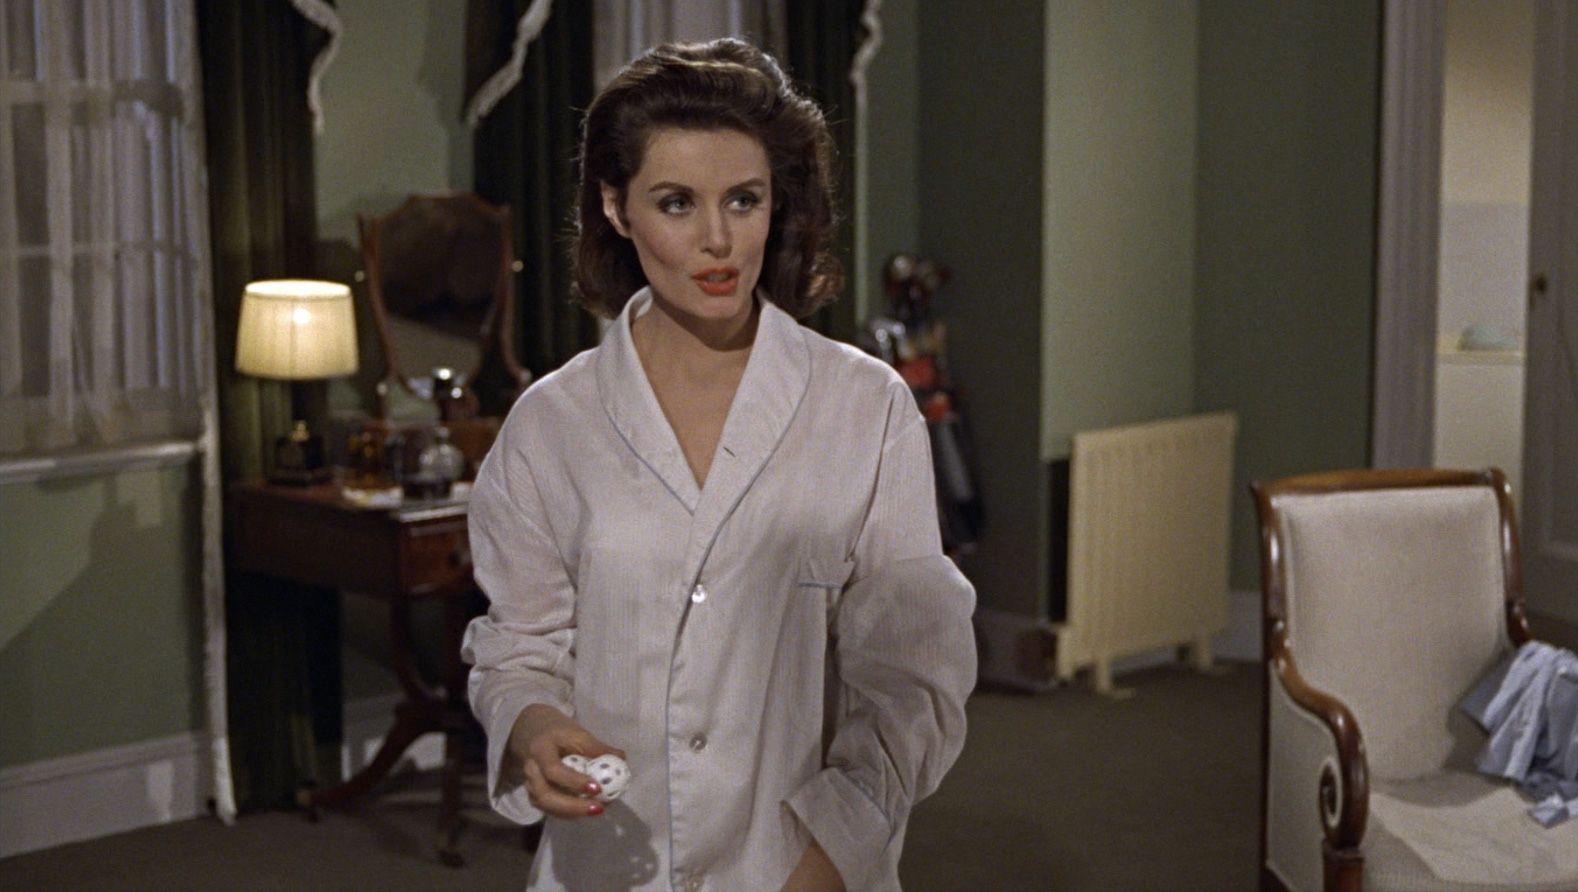 Bond Girl Casino Royale Dress Bond Girl #2 - Sylvia ...